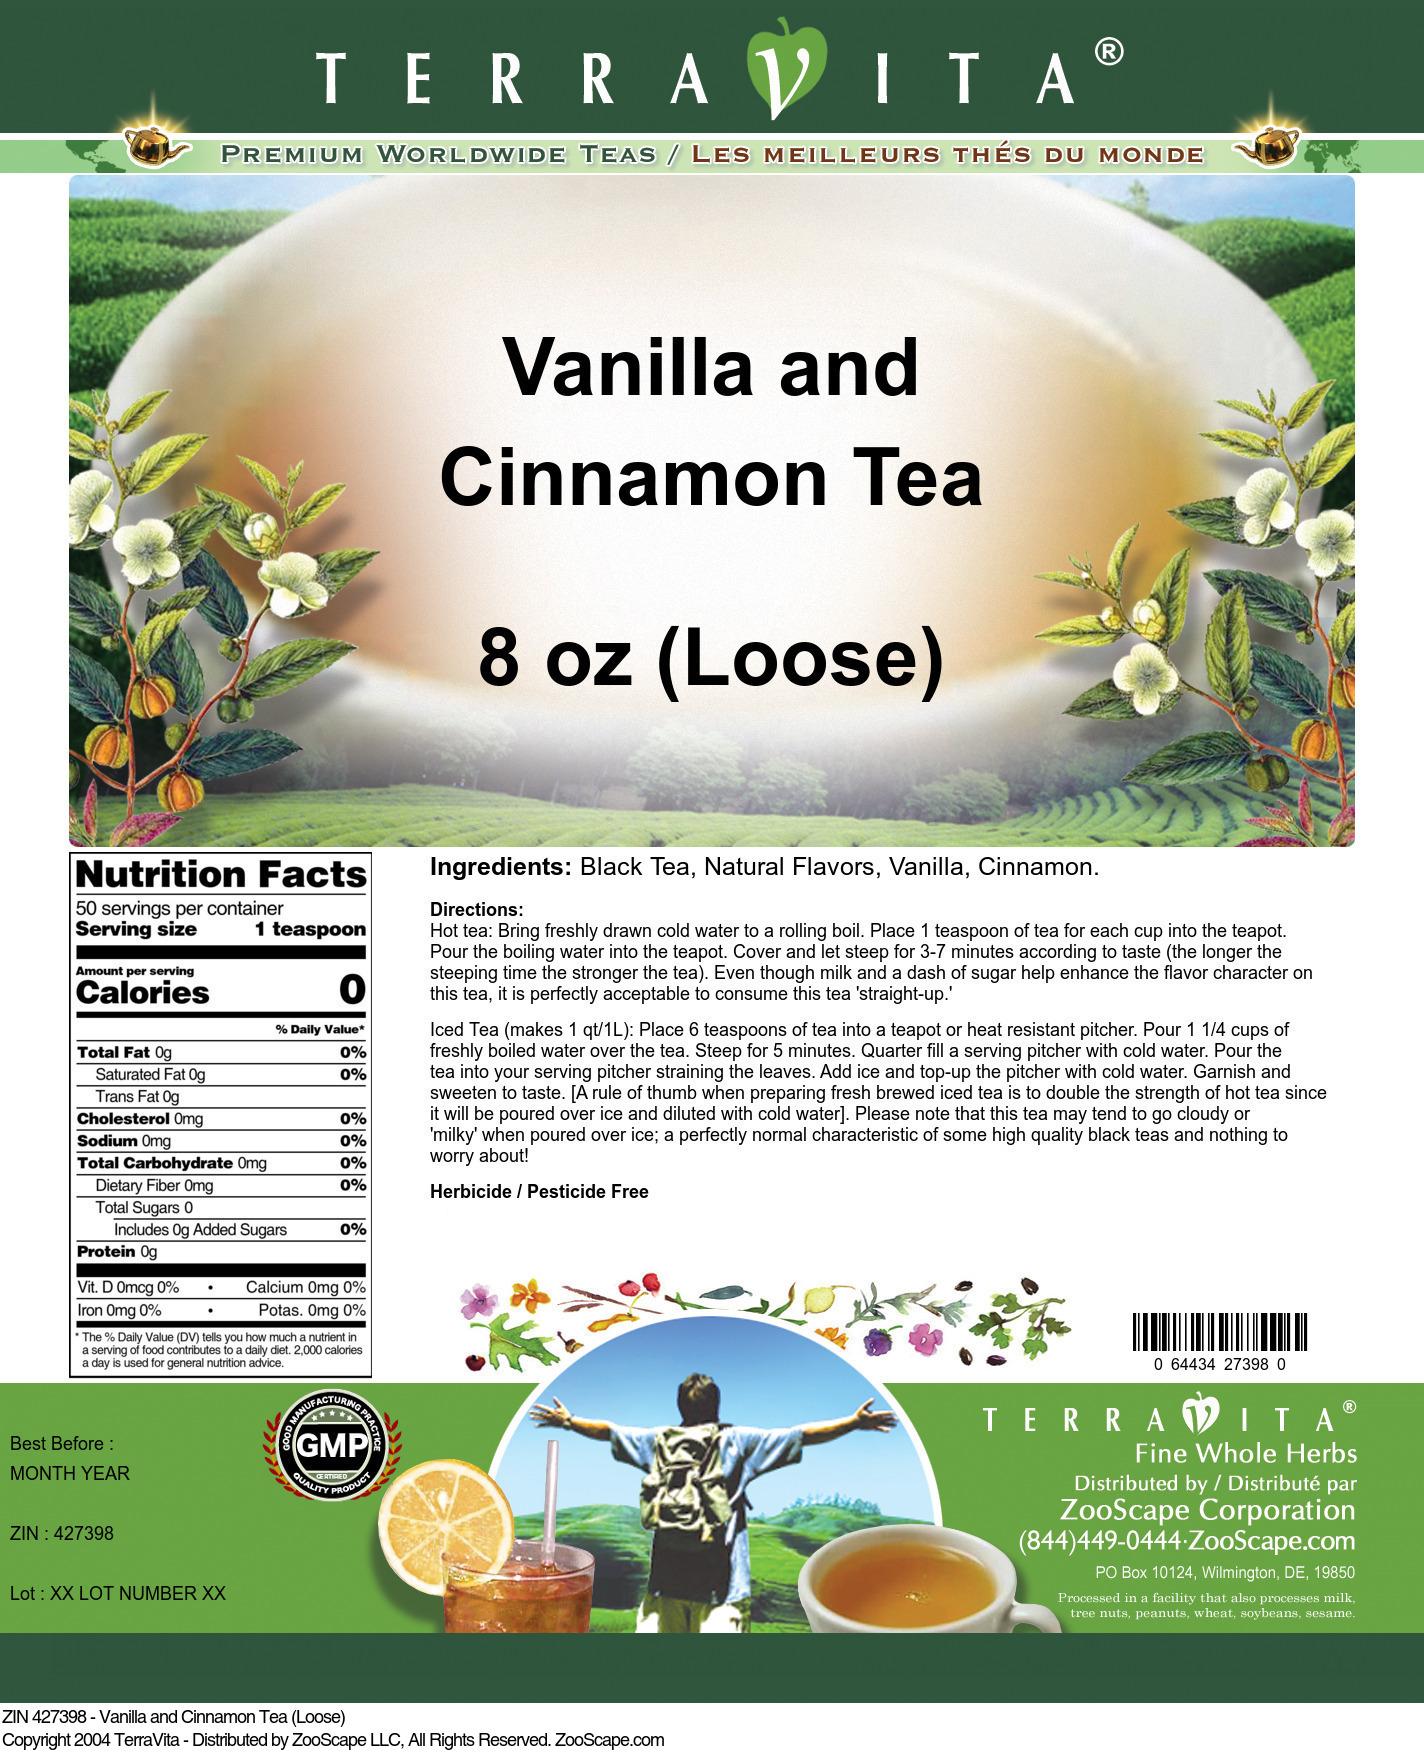 Vanilla and Cinnamon Tea (Loose)